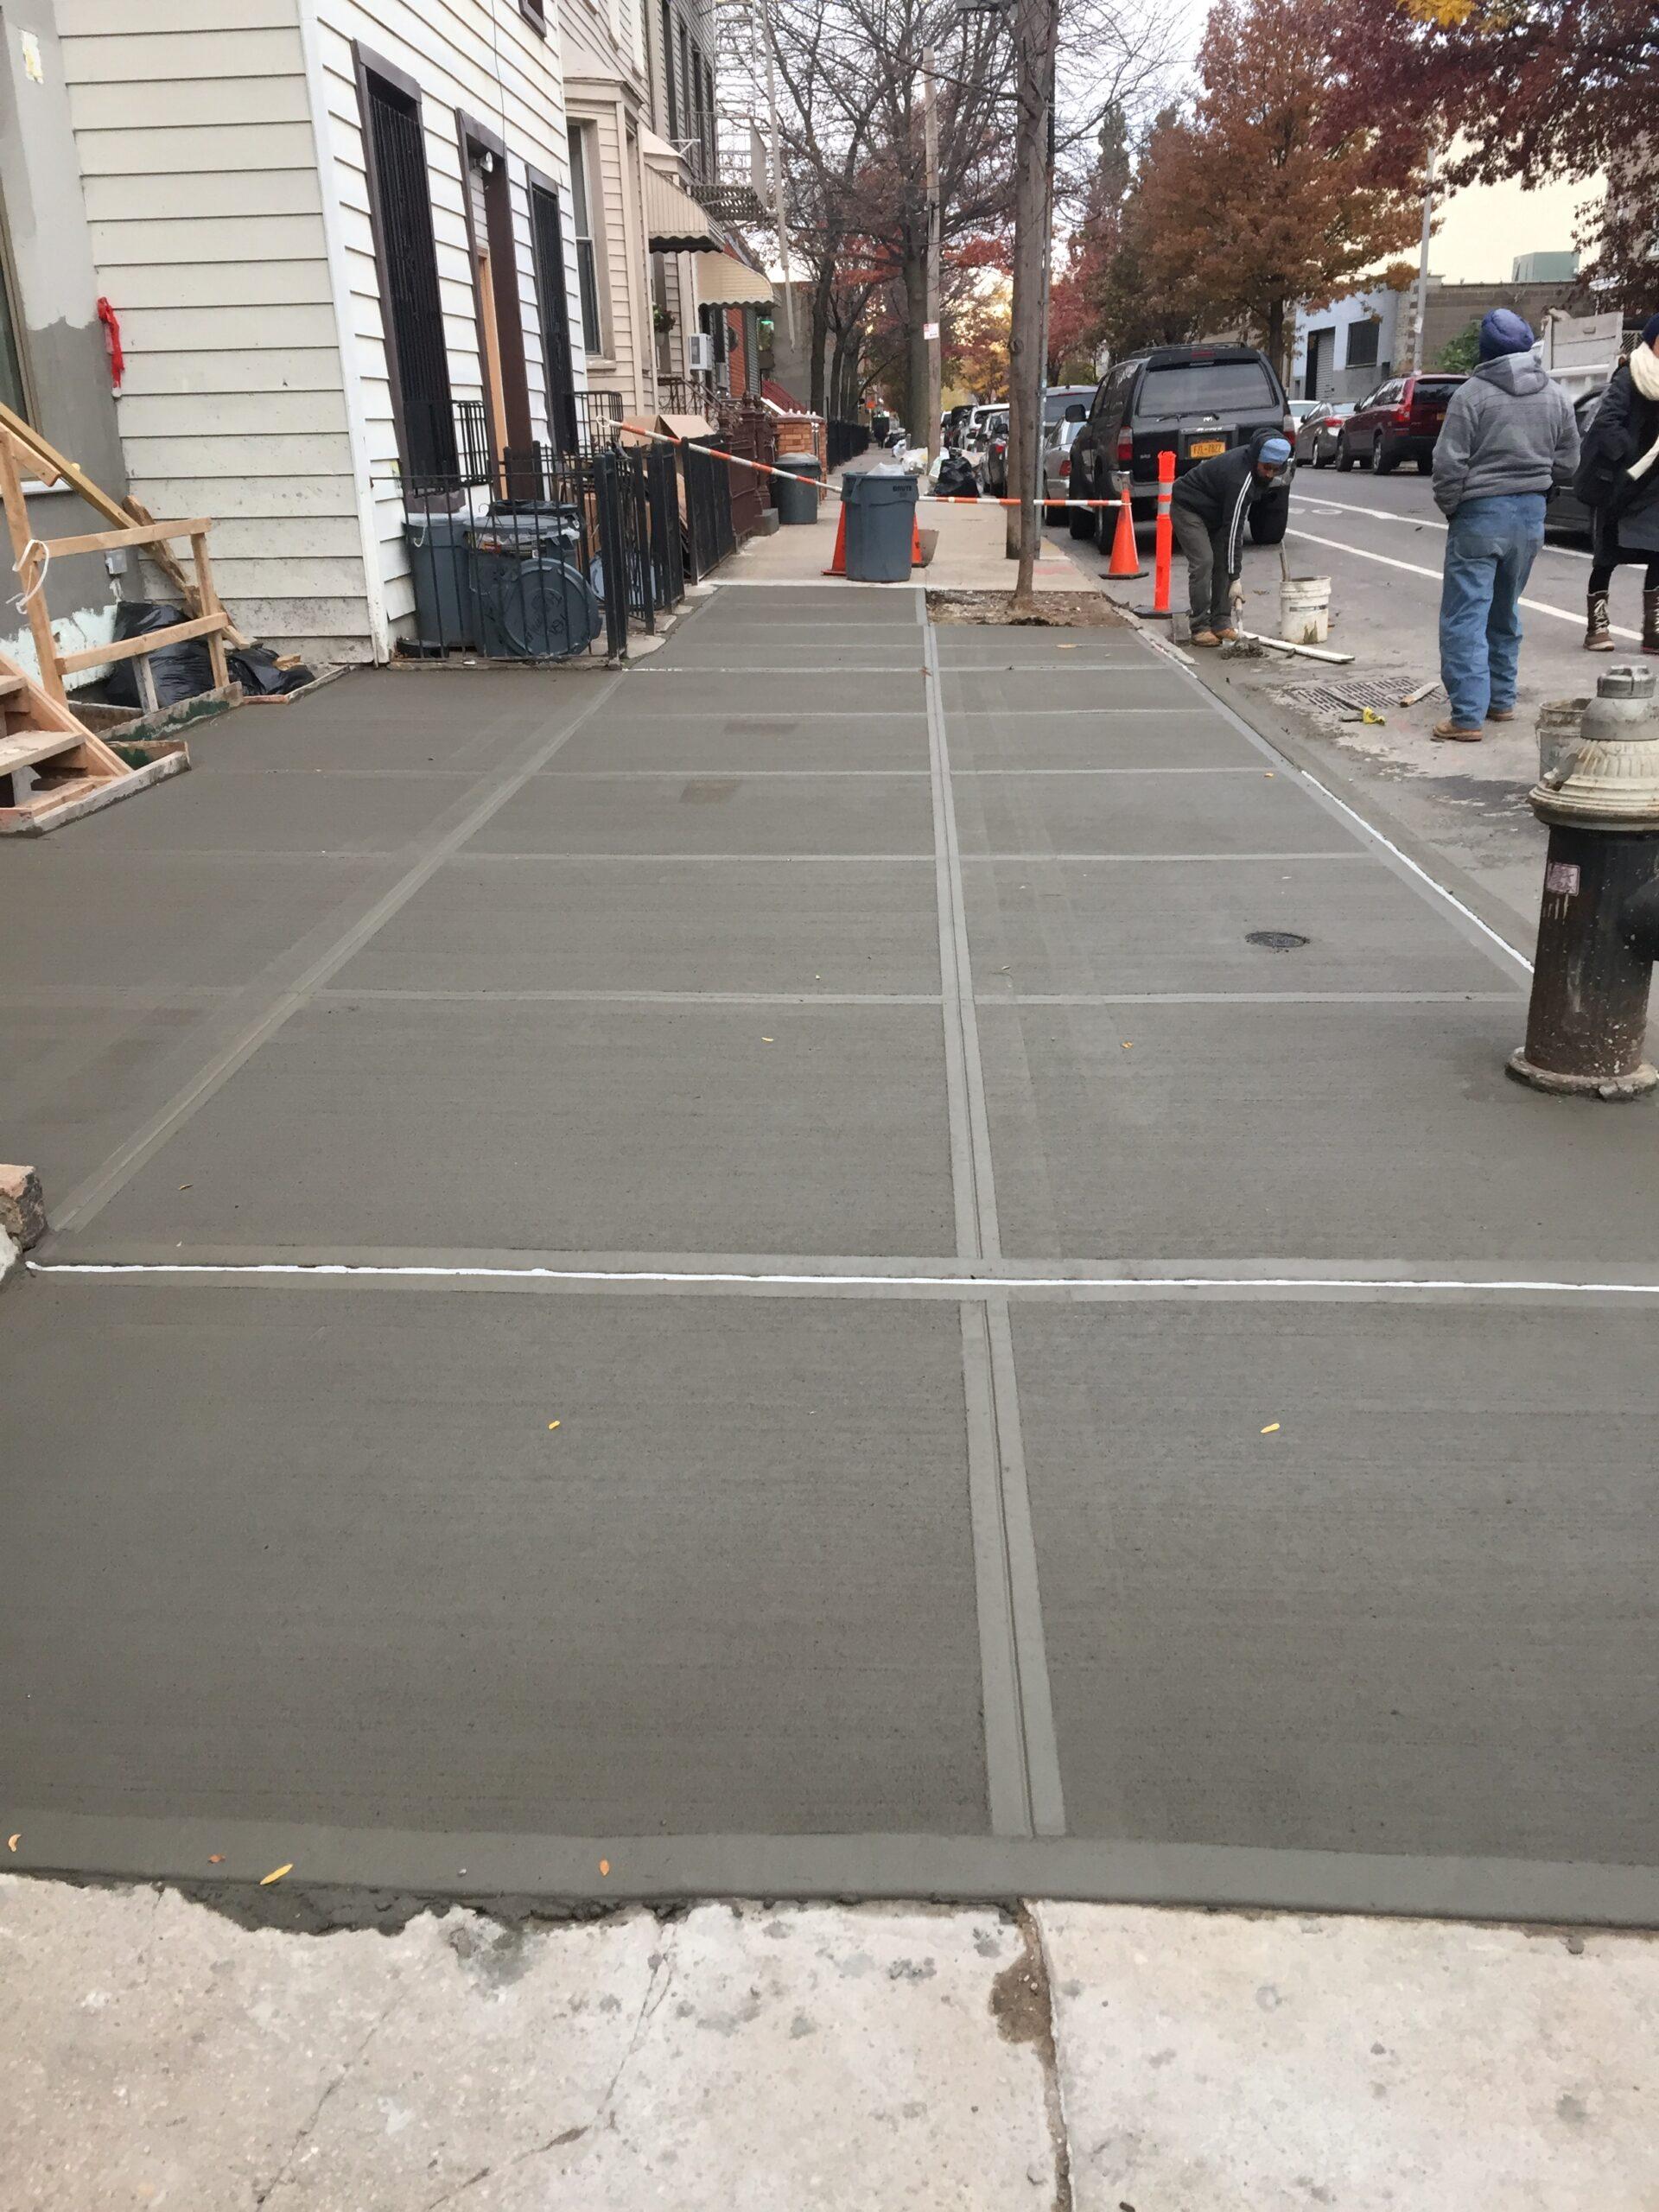 152 Freeman St- Greenpoint Brooklyn- Sidewalk Concrete Repair